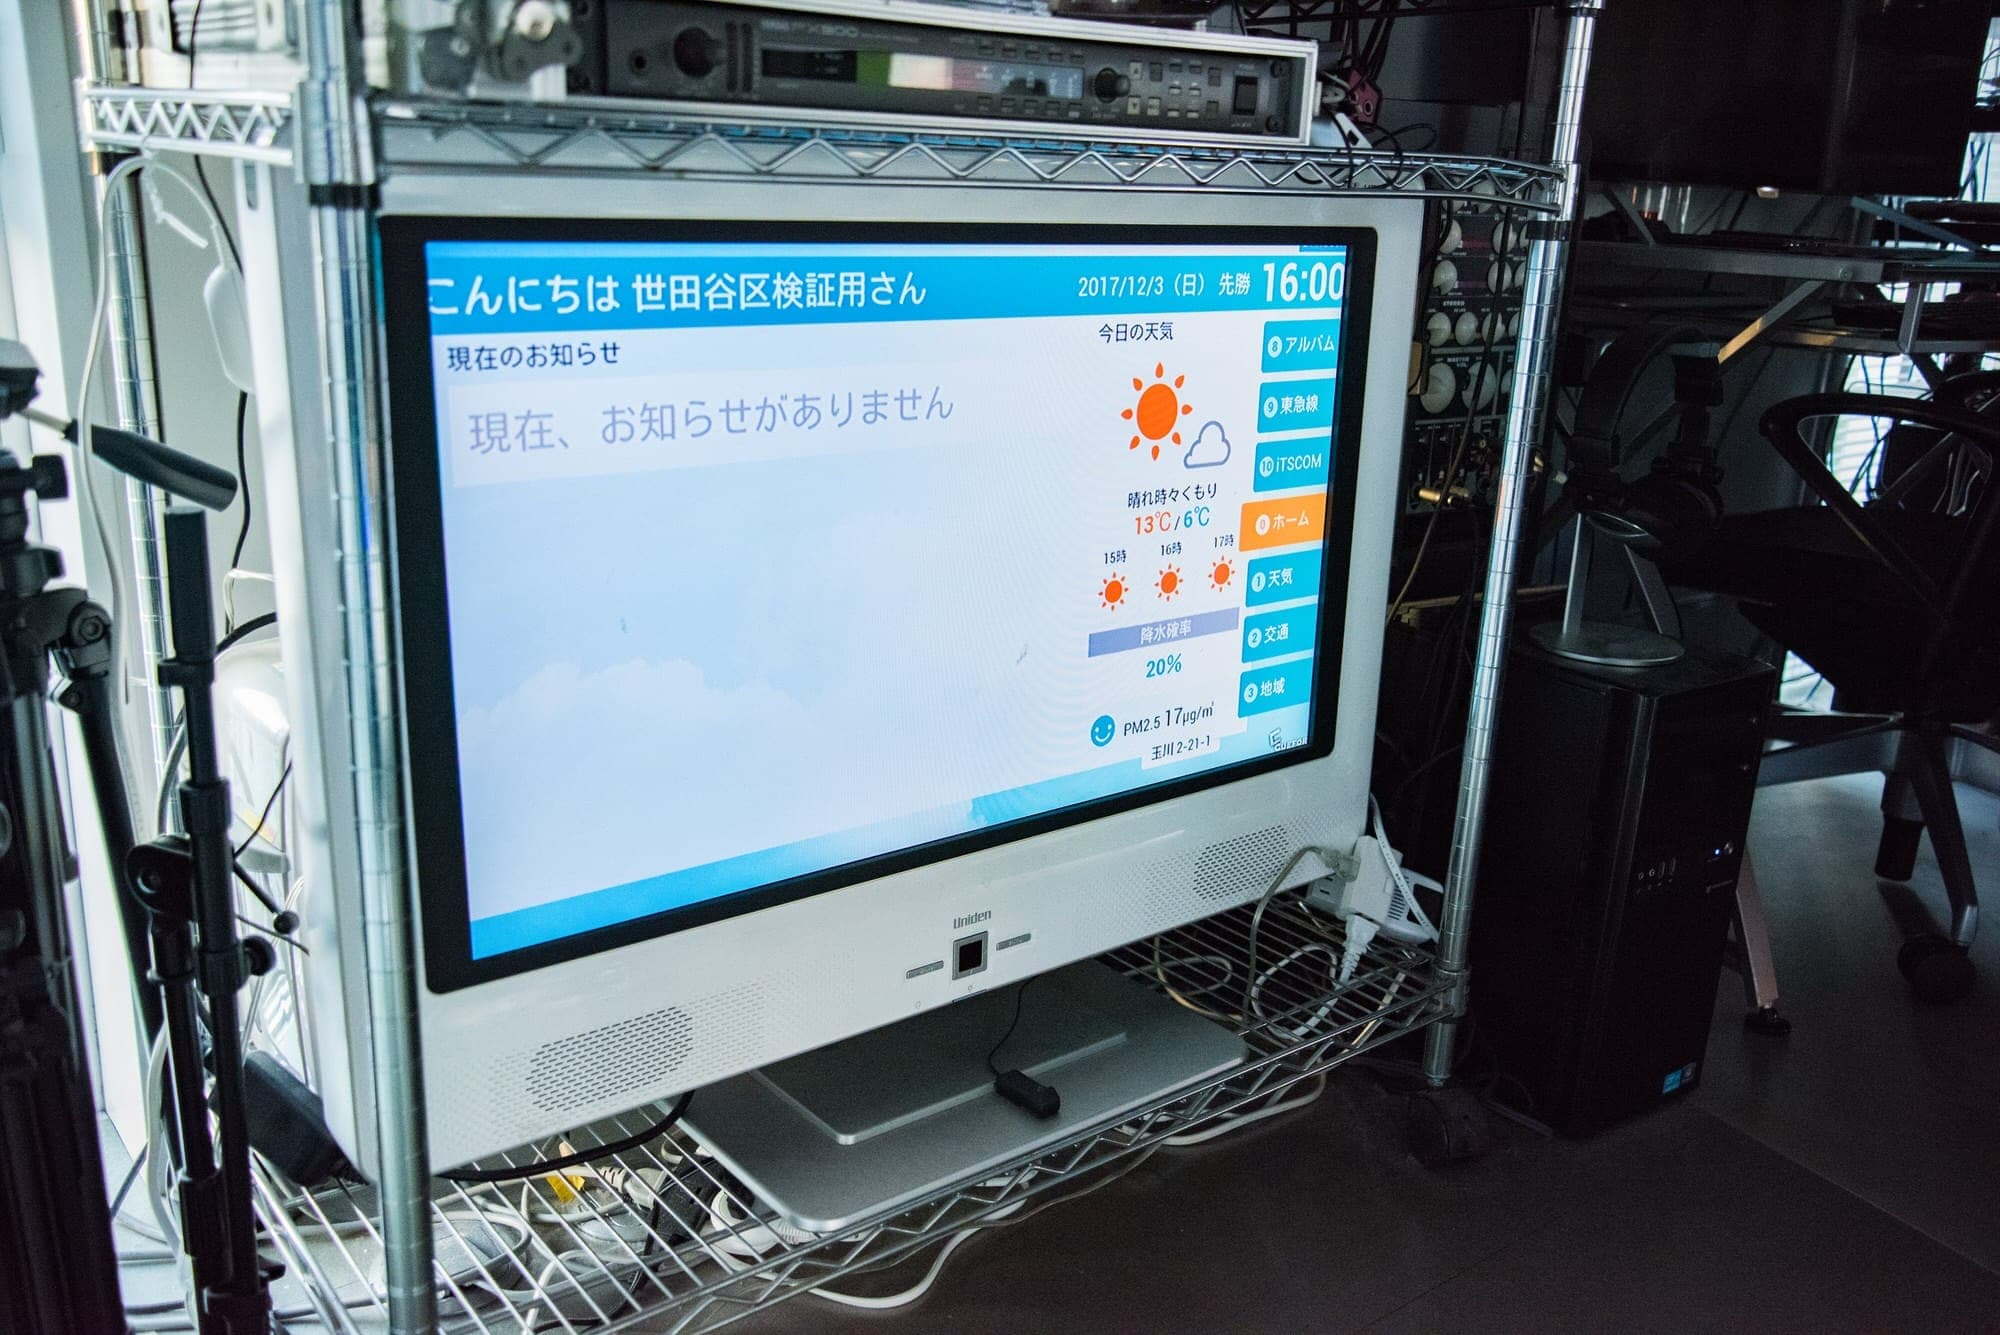 iTSCOMさんの提供するテレビプッシュ